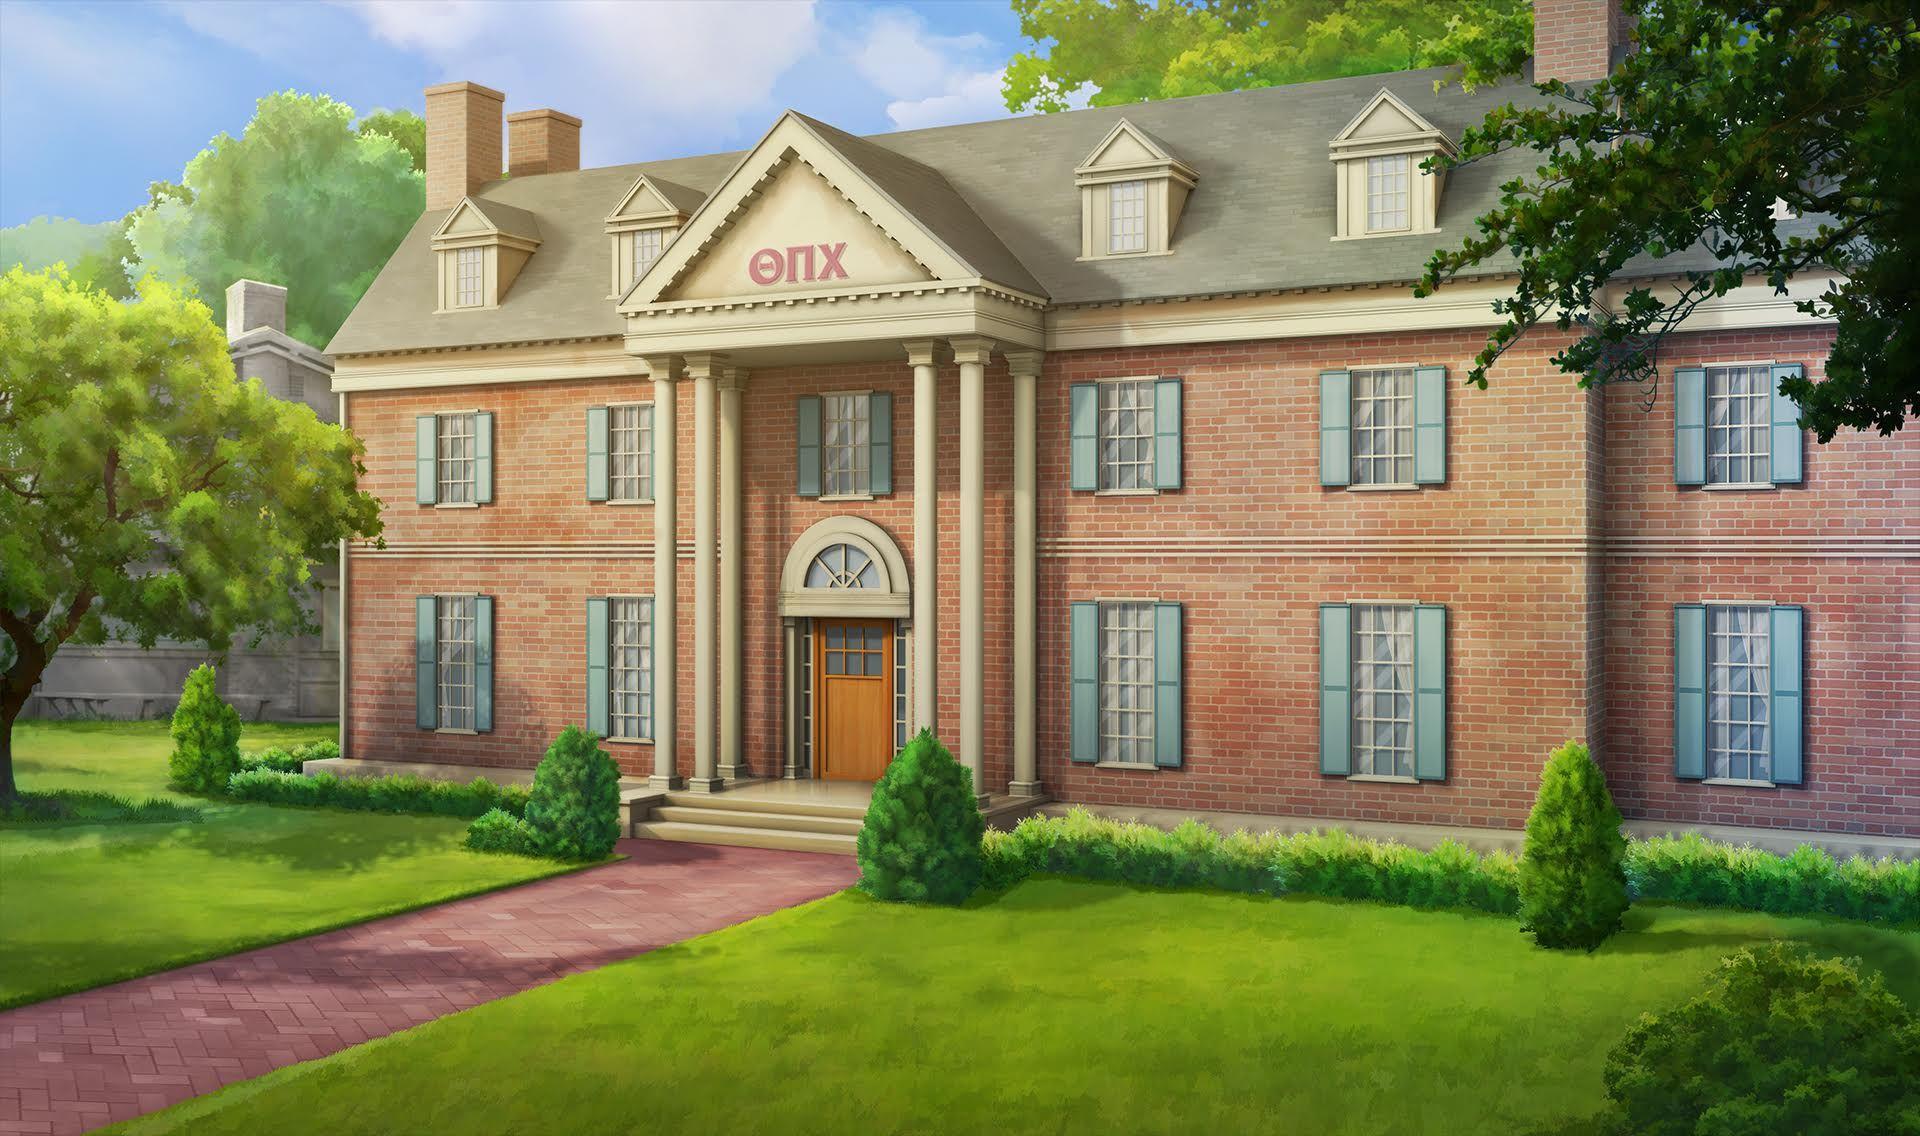 Ext frat house day episode pinterest anime for Exterior background